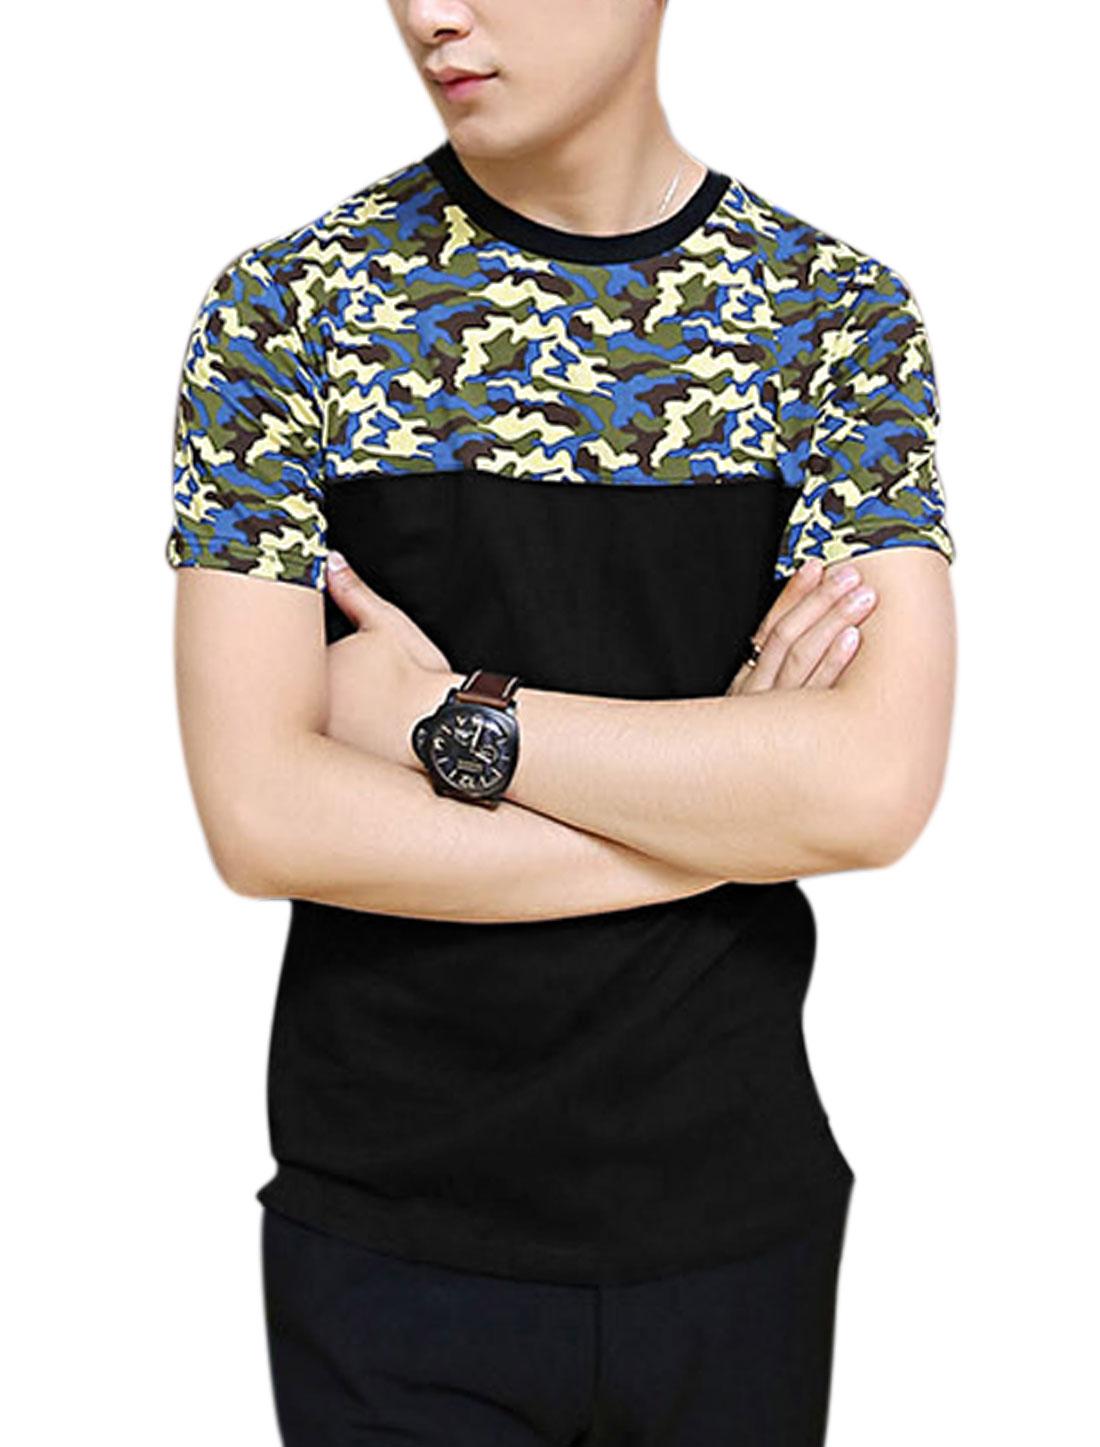 Men Short Sleeve Zip Up Side Hem Fashion Tee Shirt Black M